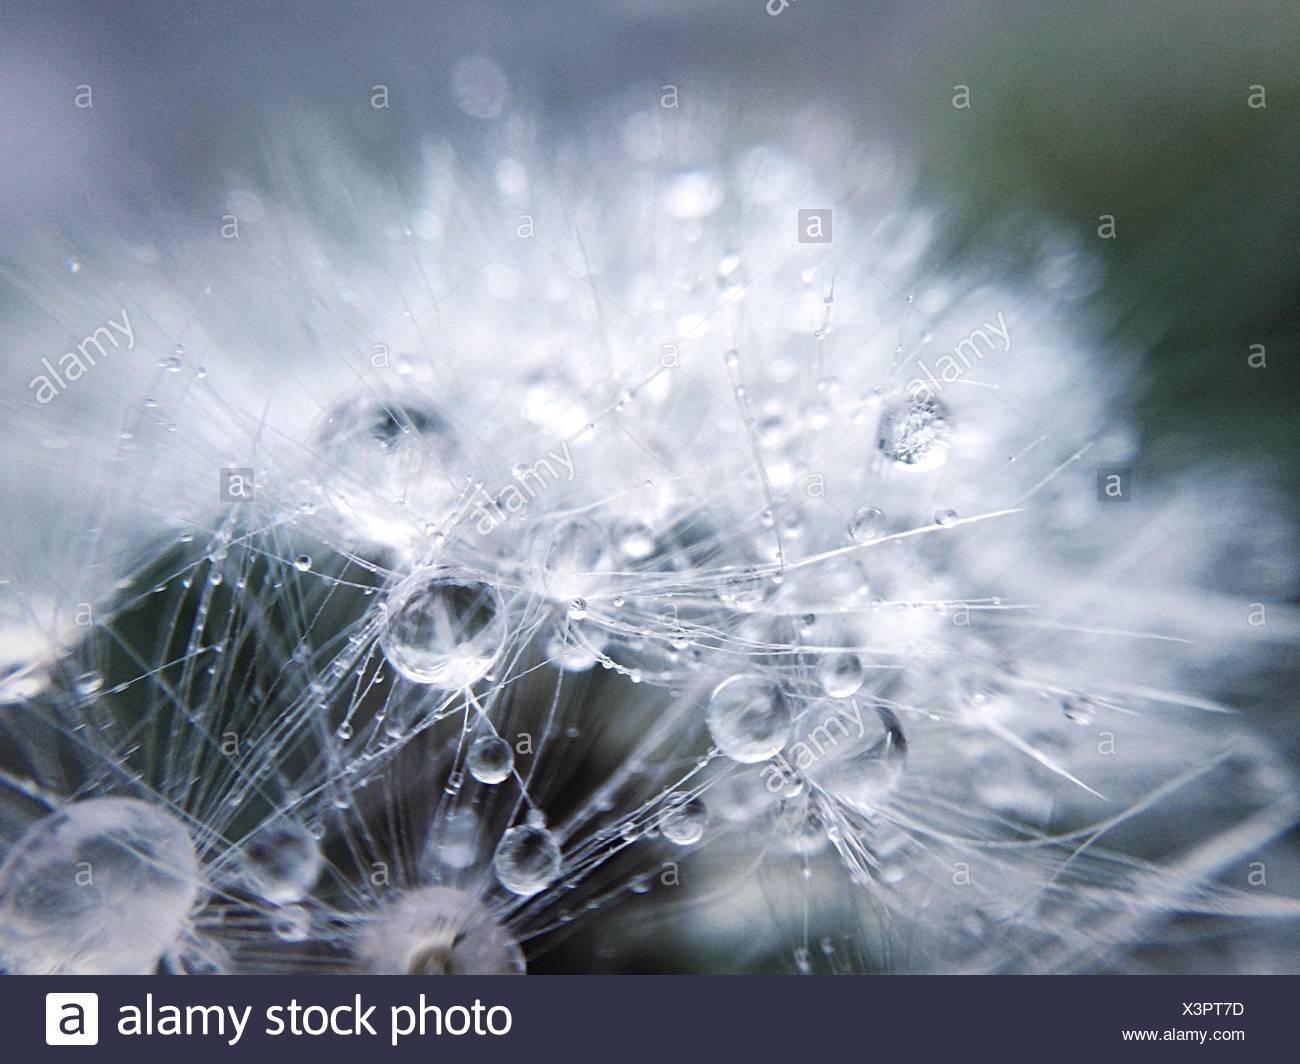 Close-Up Of Raindrops On Dandelion - Stock Image